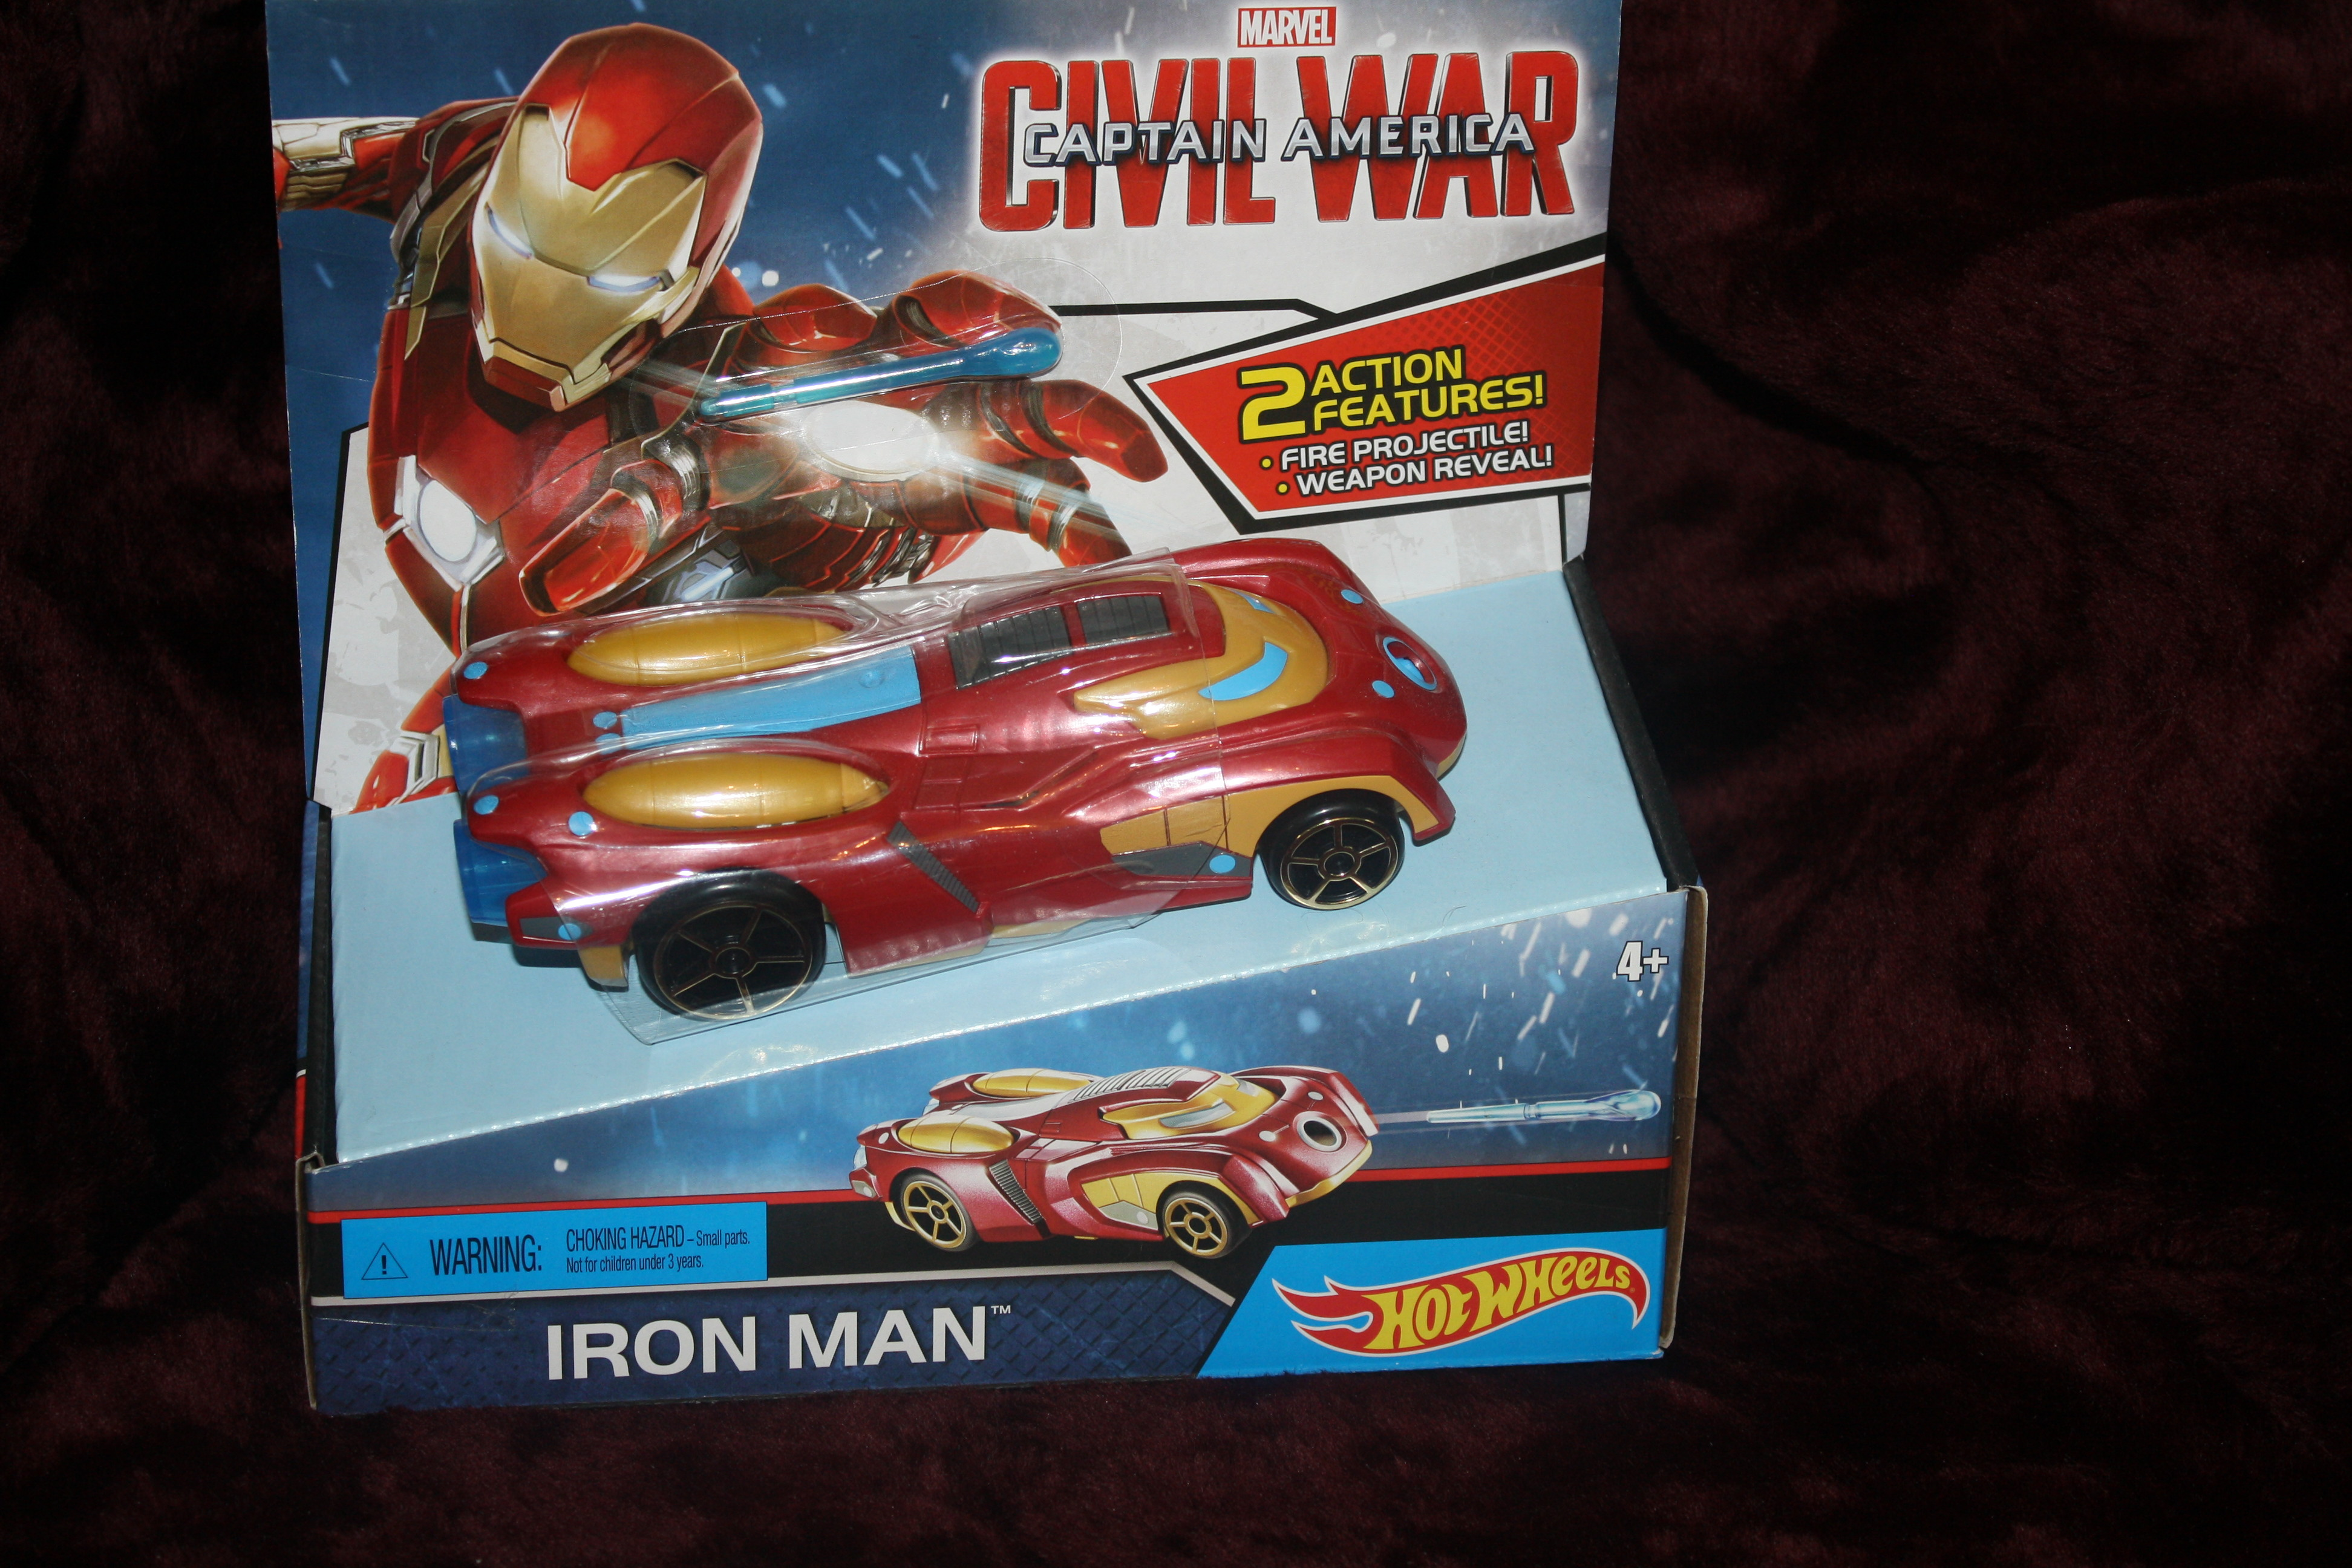 82. Iron man